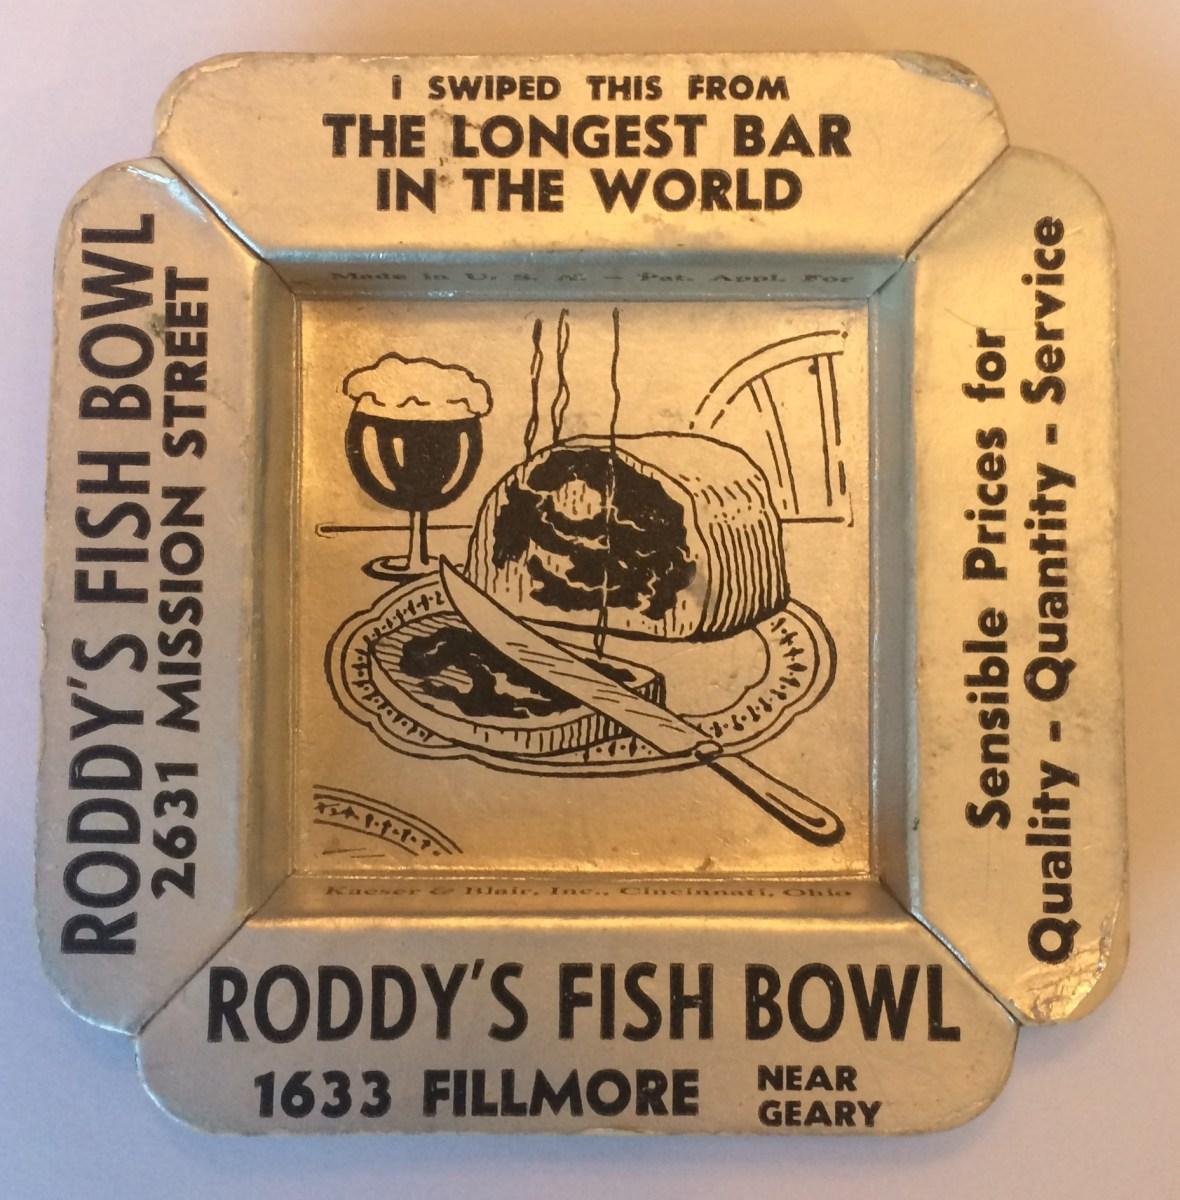 Roddy's Fish Bowl - 1633 Fillmore Street, San Francisco, California U.S.A. - date unknown